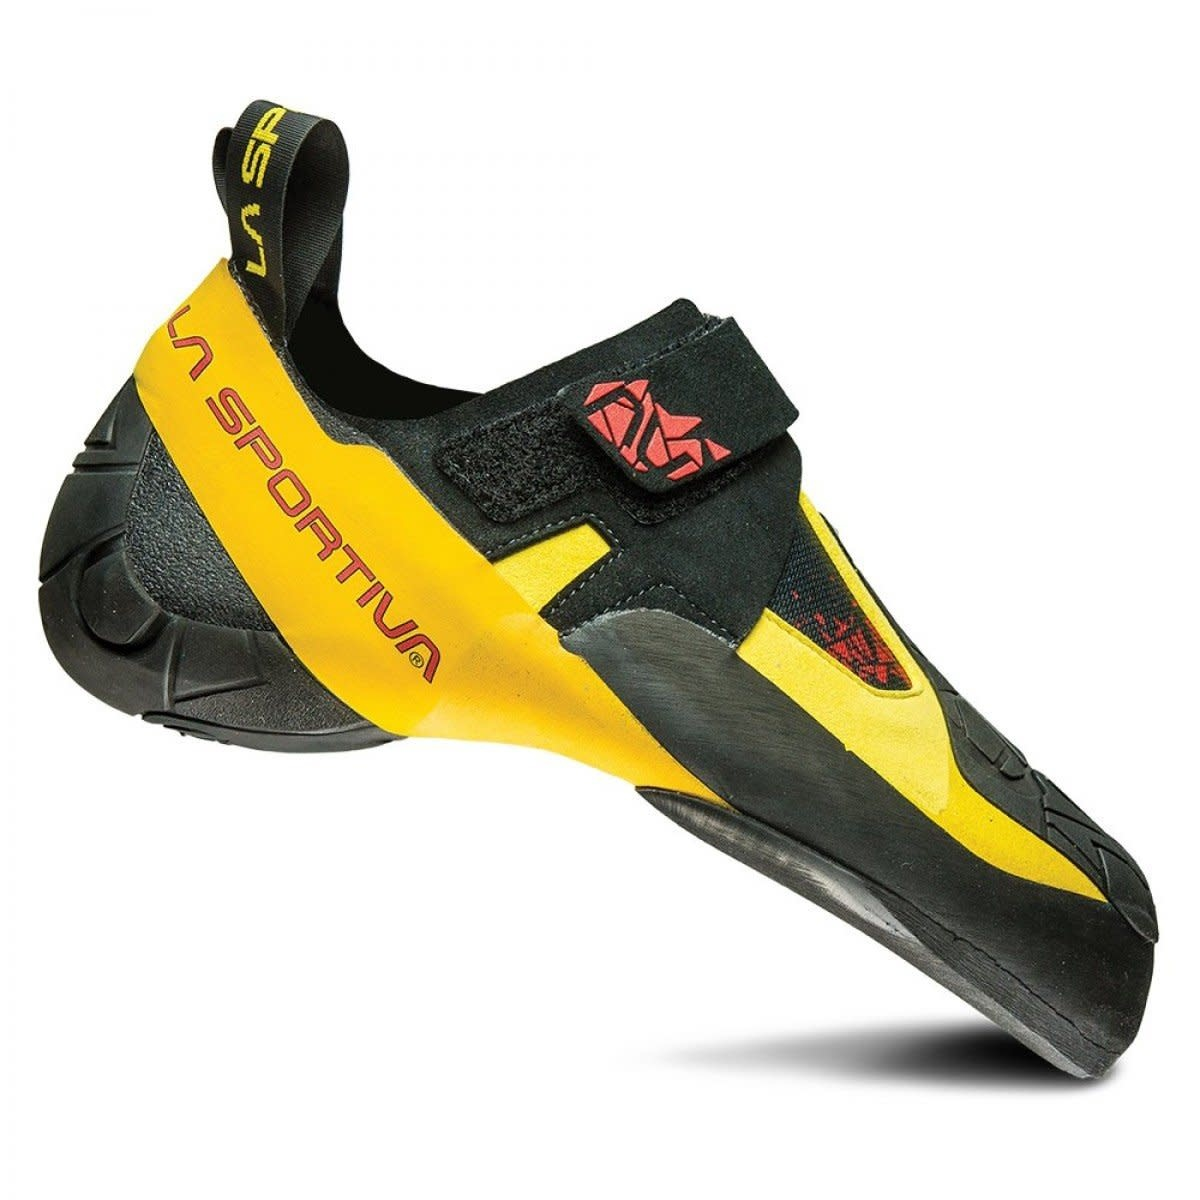 La Sportiva Skwama Rock Climbing Shoe